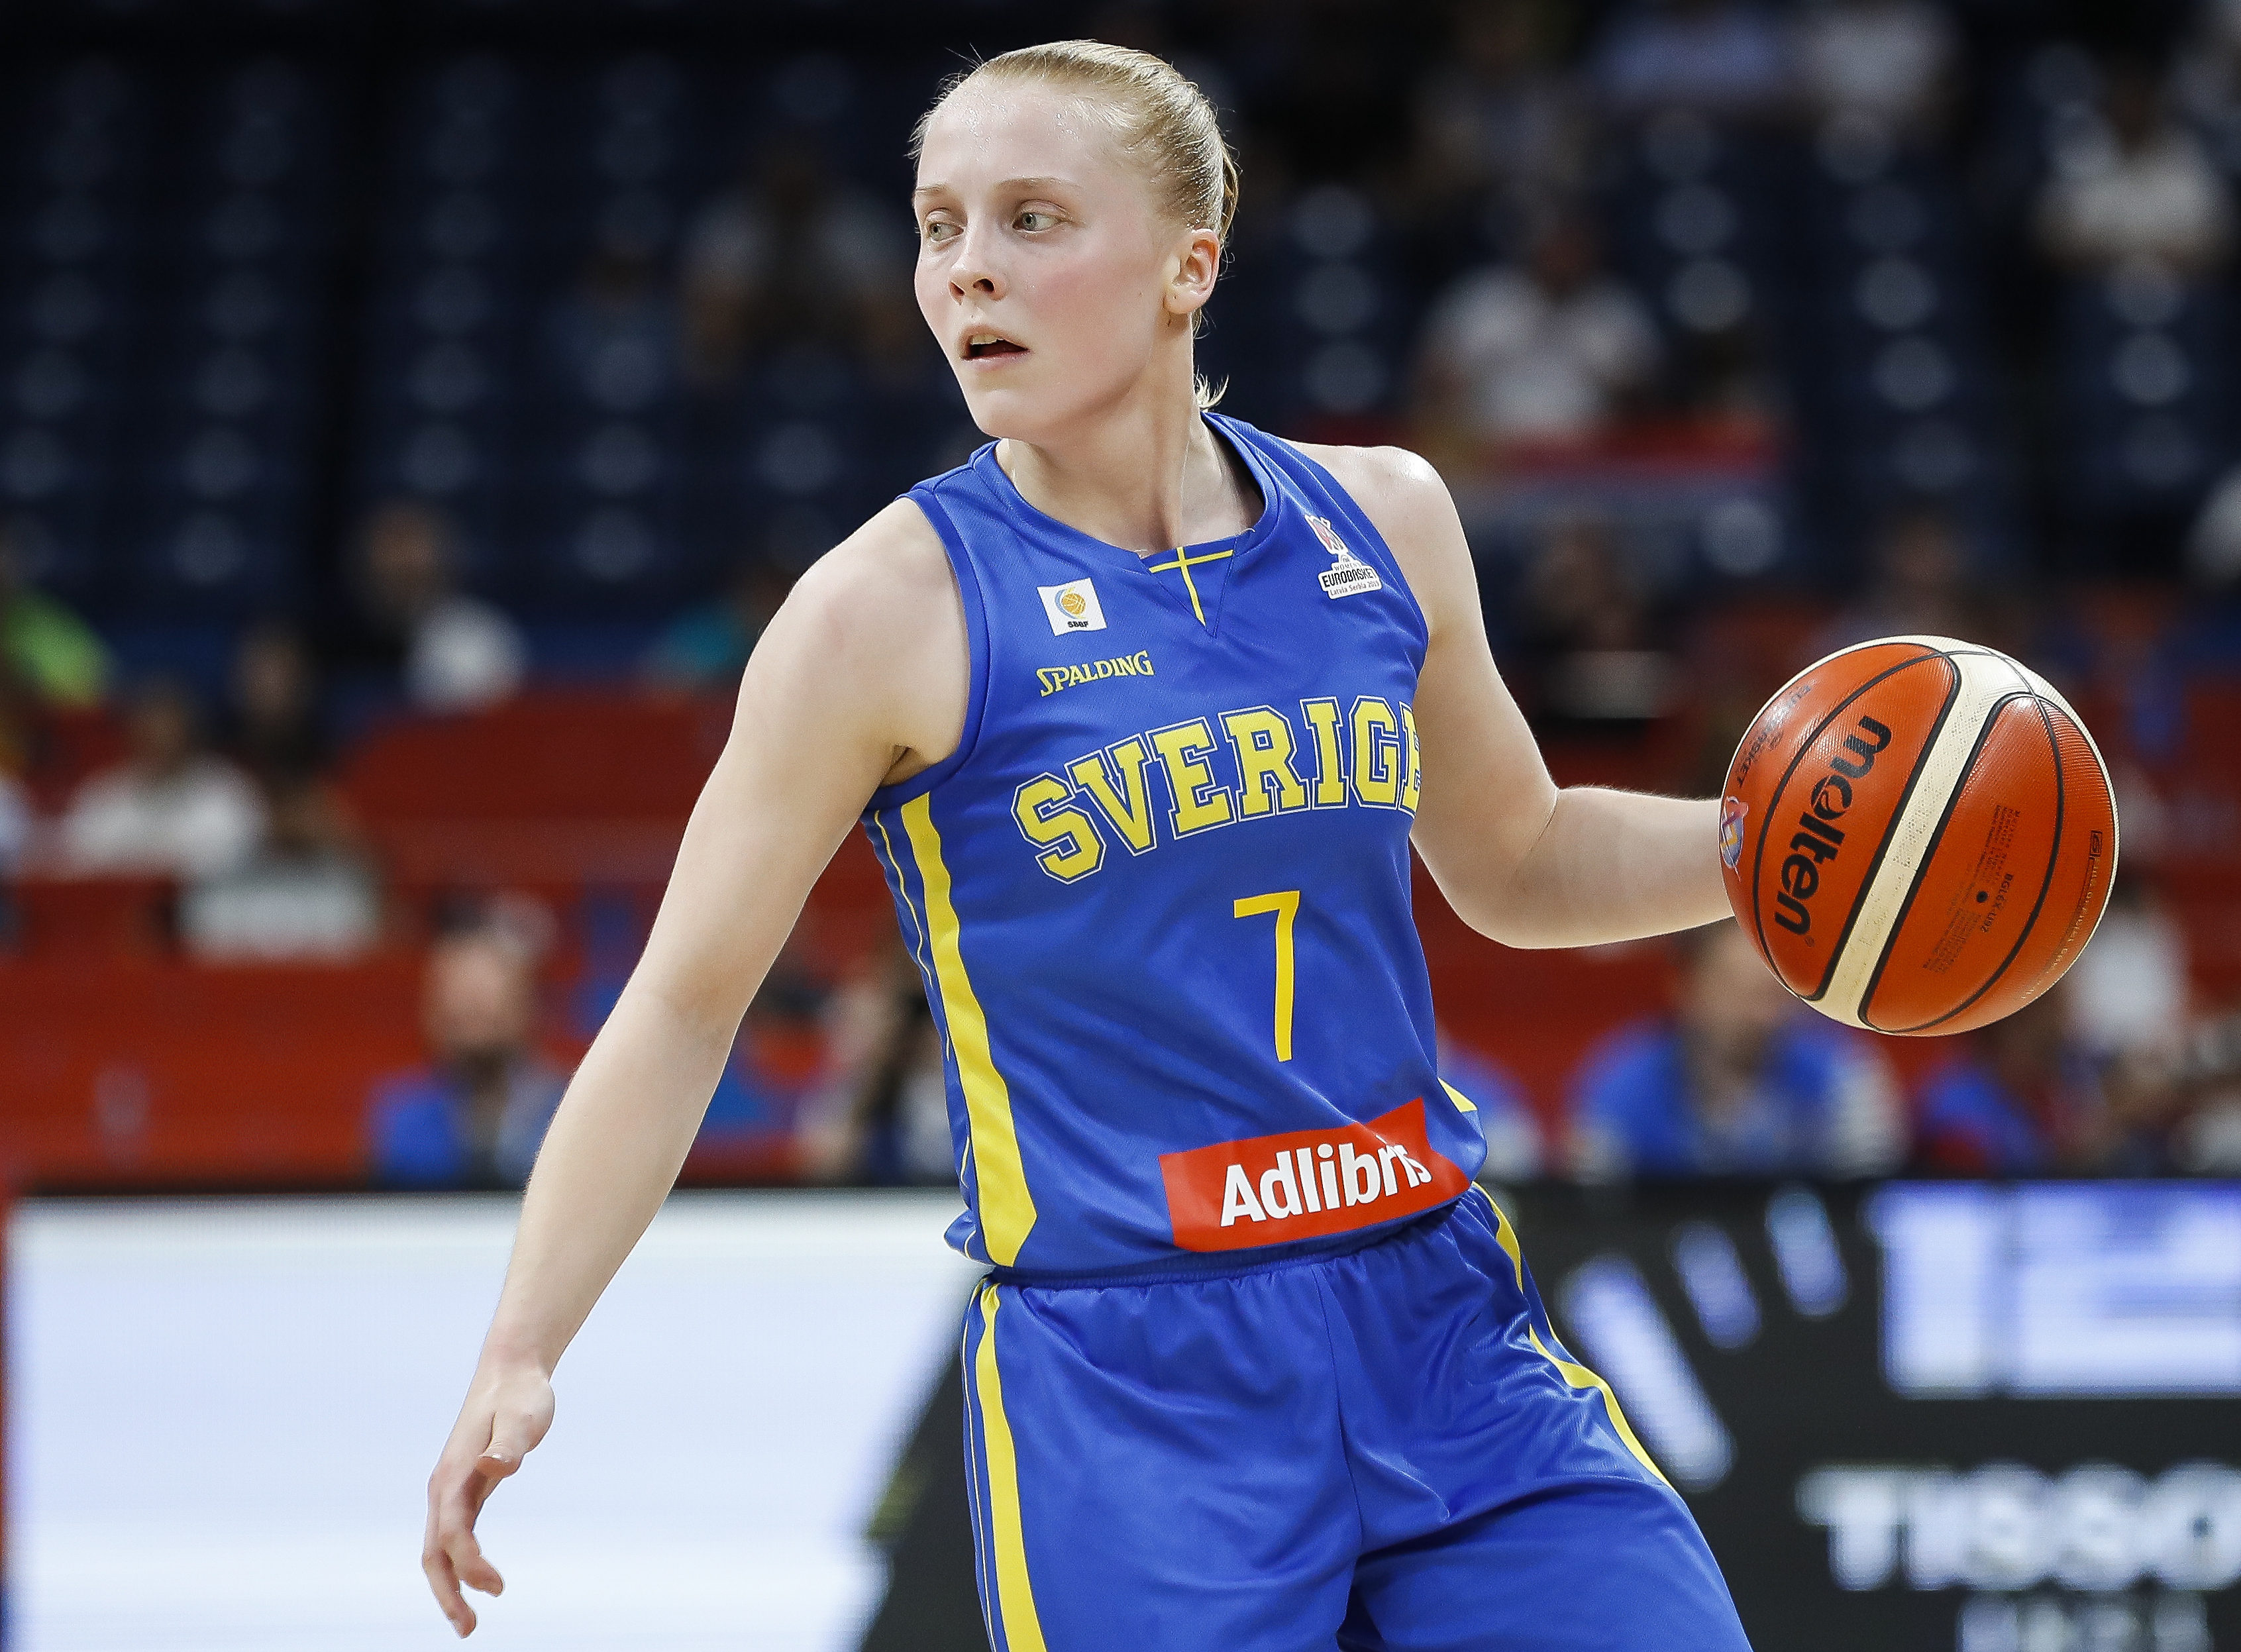 Women's EURO Basketball Championship - Quarter-Final